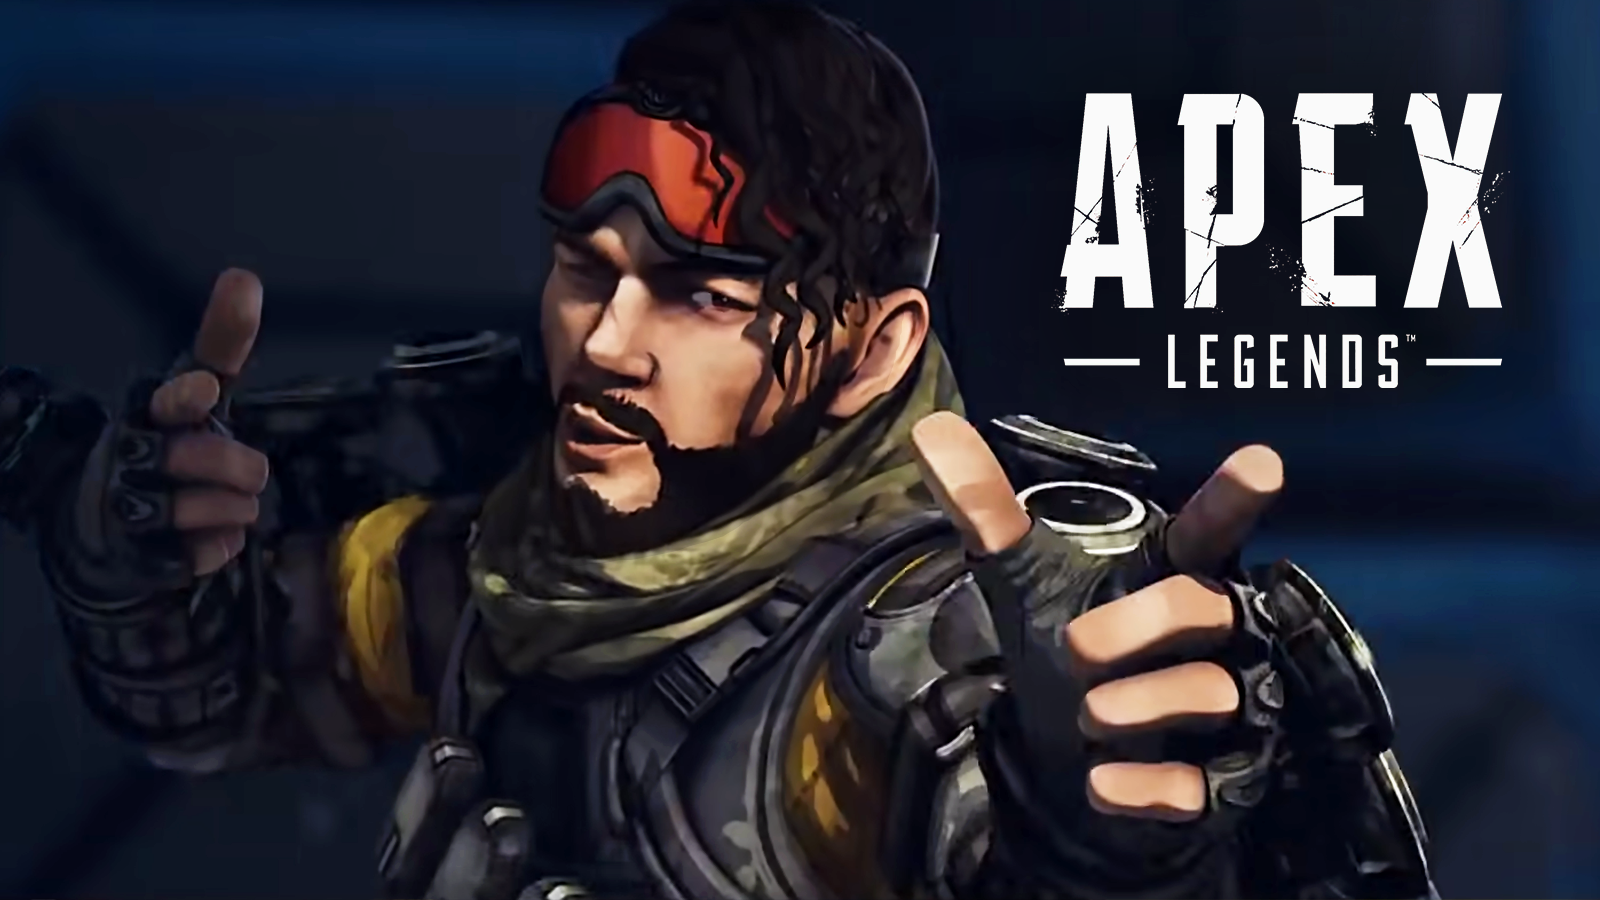 Mirage pointing next to Apex Legends logo